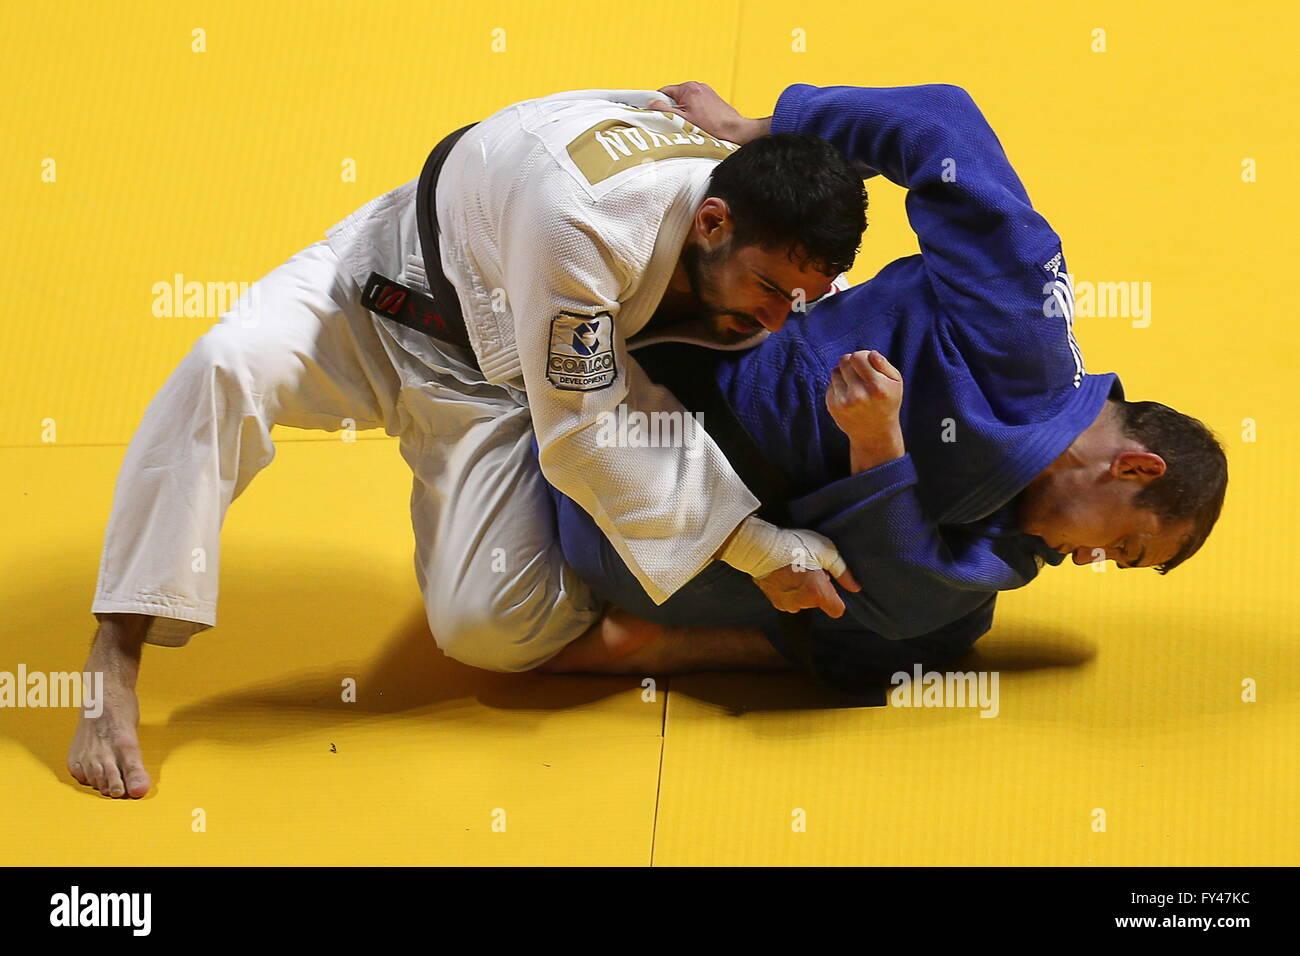 Kazan, Russia. Xxi Aprile, 2016. Judoka russo Arsen Galstyan (L) e l'Ucraino judoka Gevorg Khachatrian competere Immagini Stock